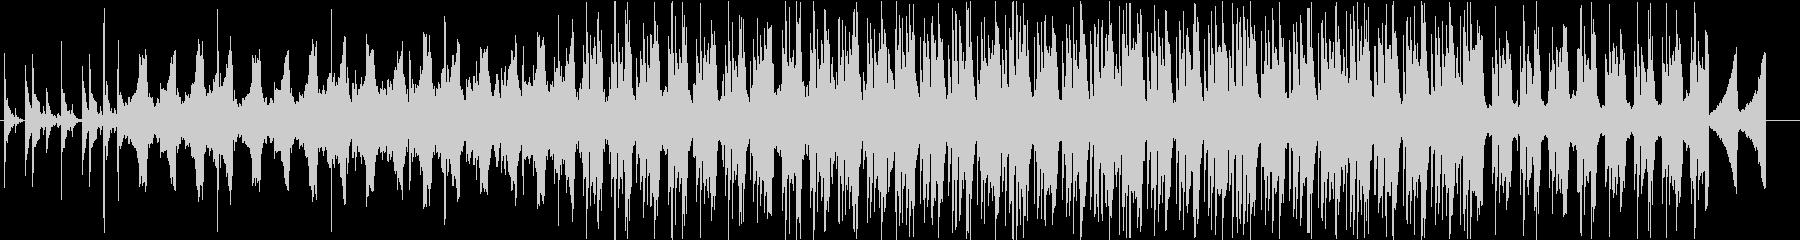 Lo-Fiな感じのエレクトロニカの未再生の波形